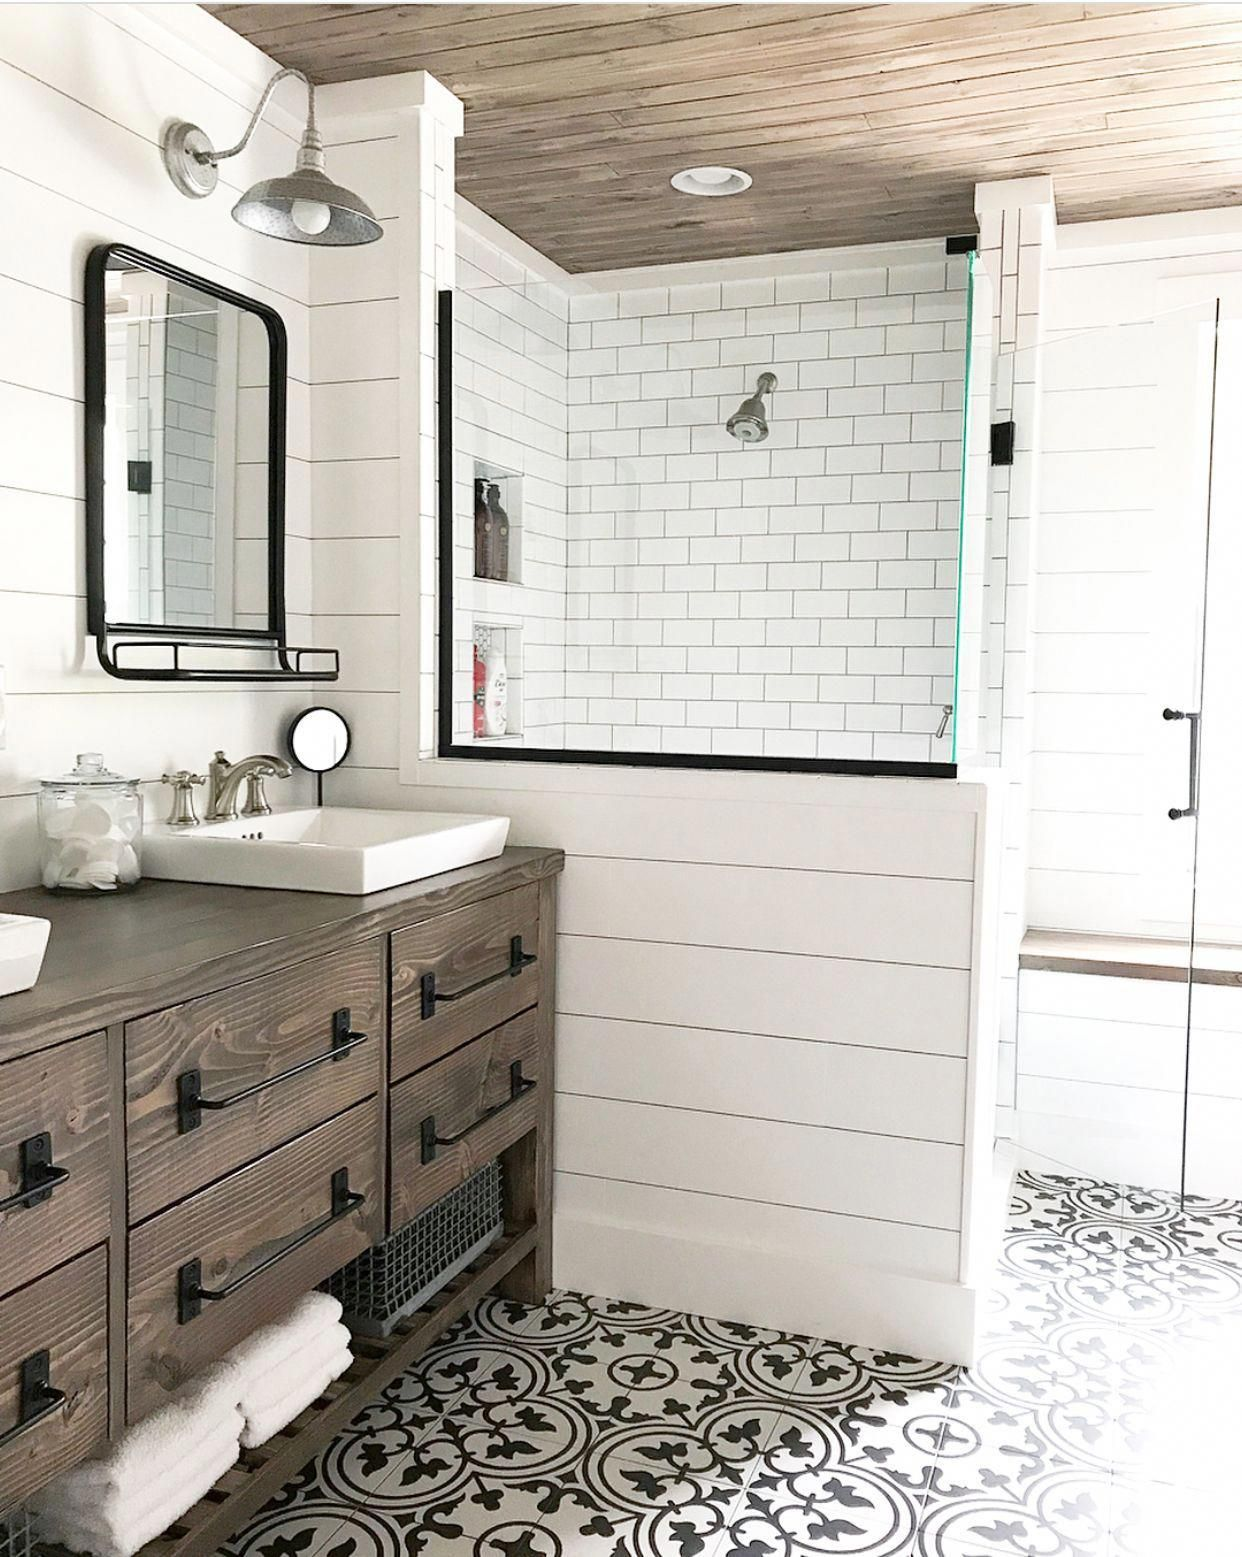 Bathroom Wastebasket Matching Bedroom And Bathroom Sets